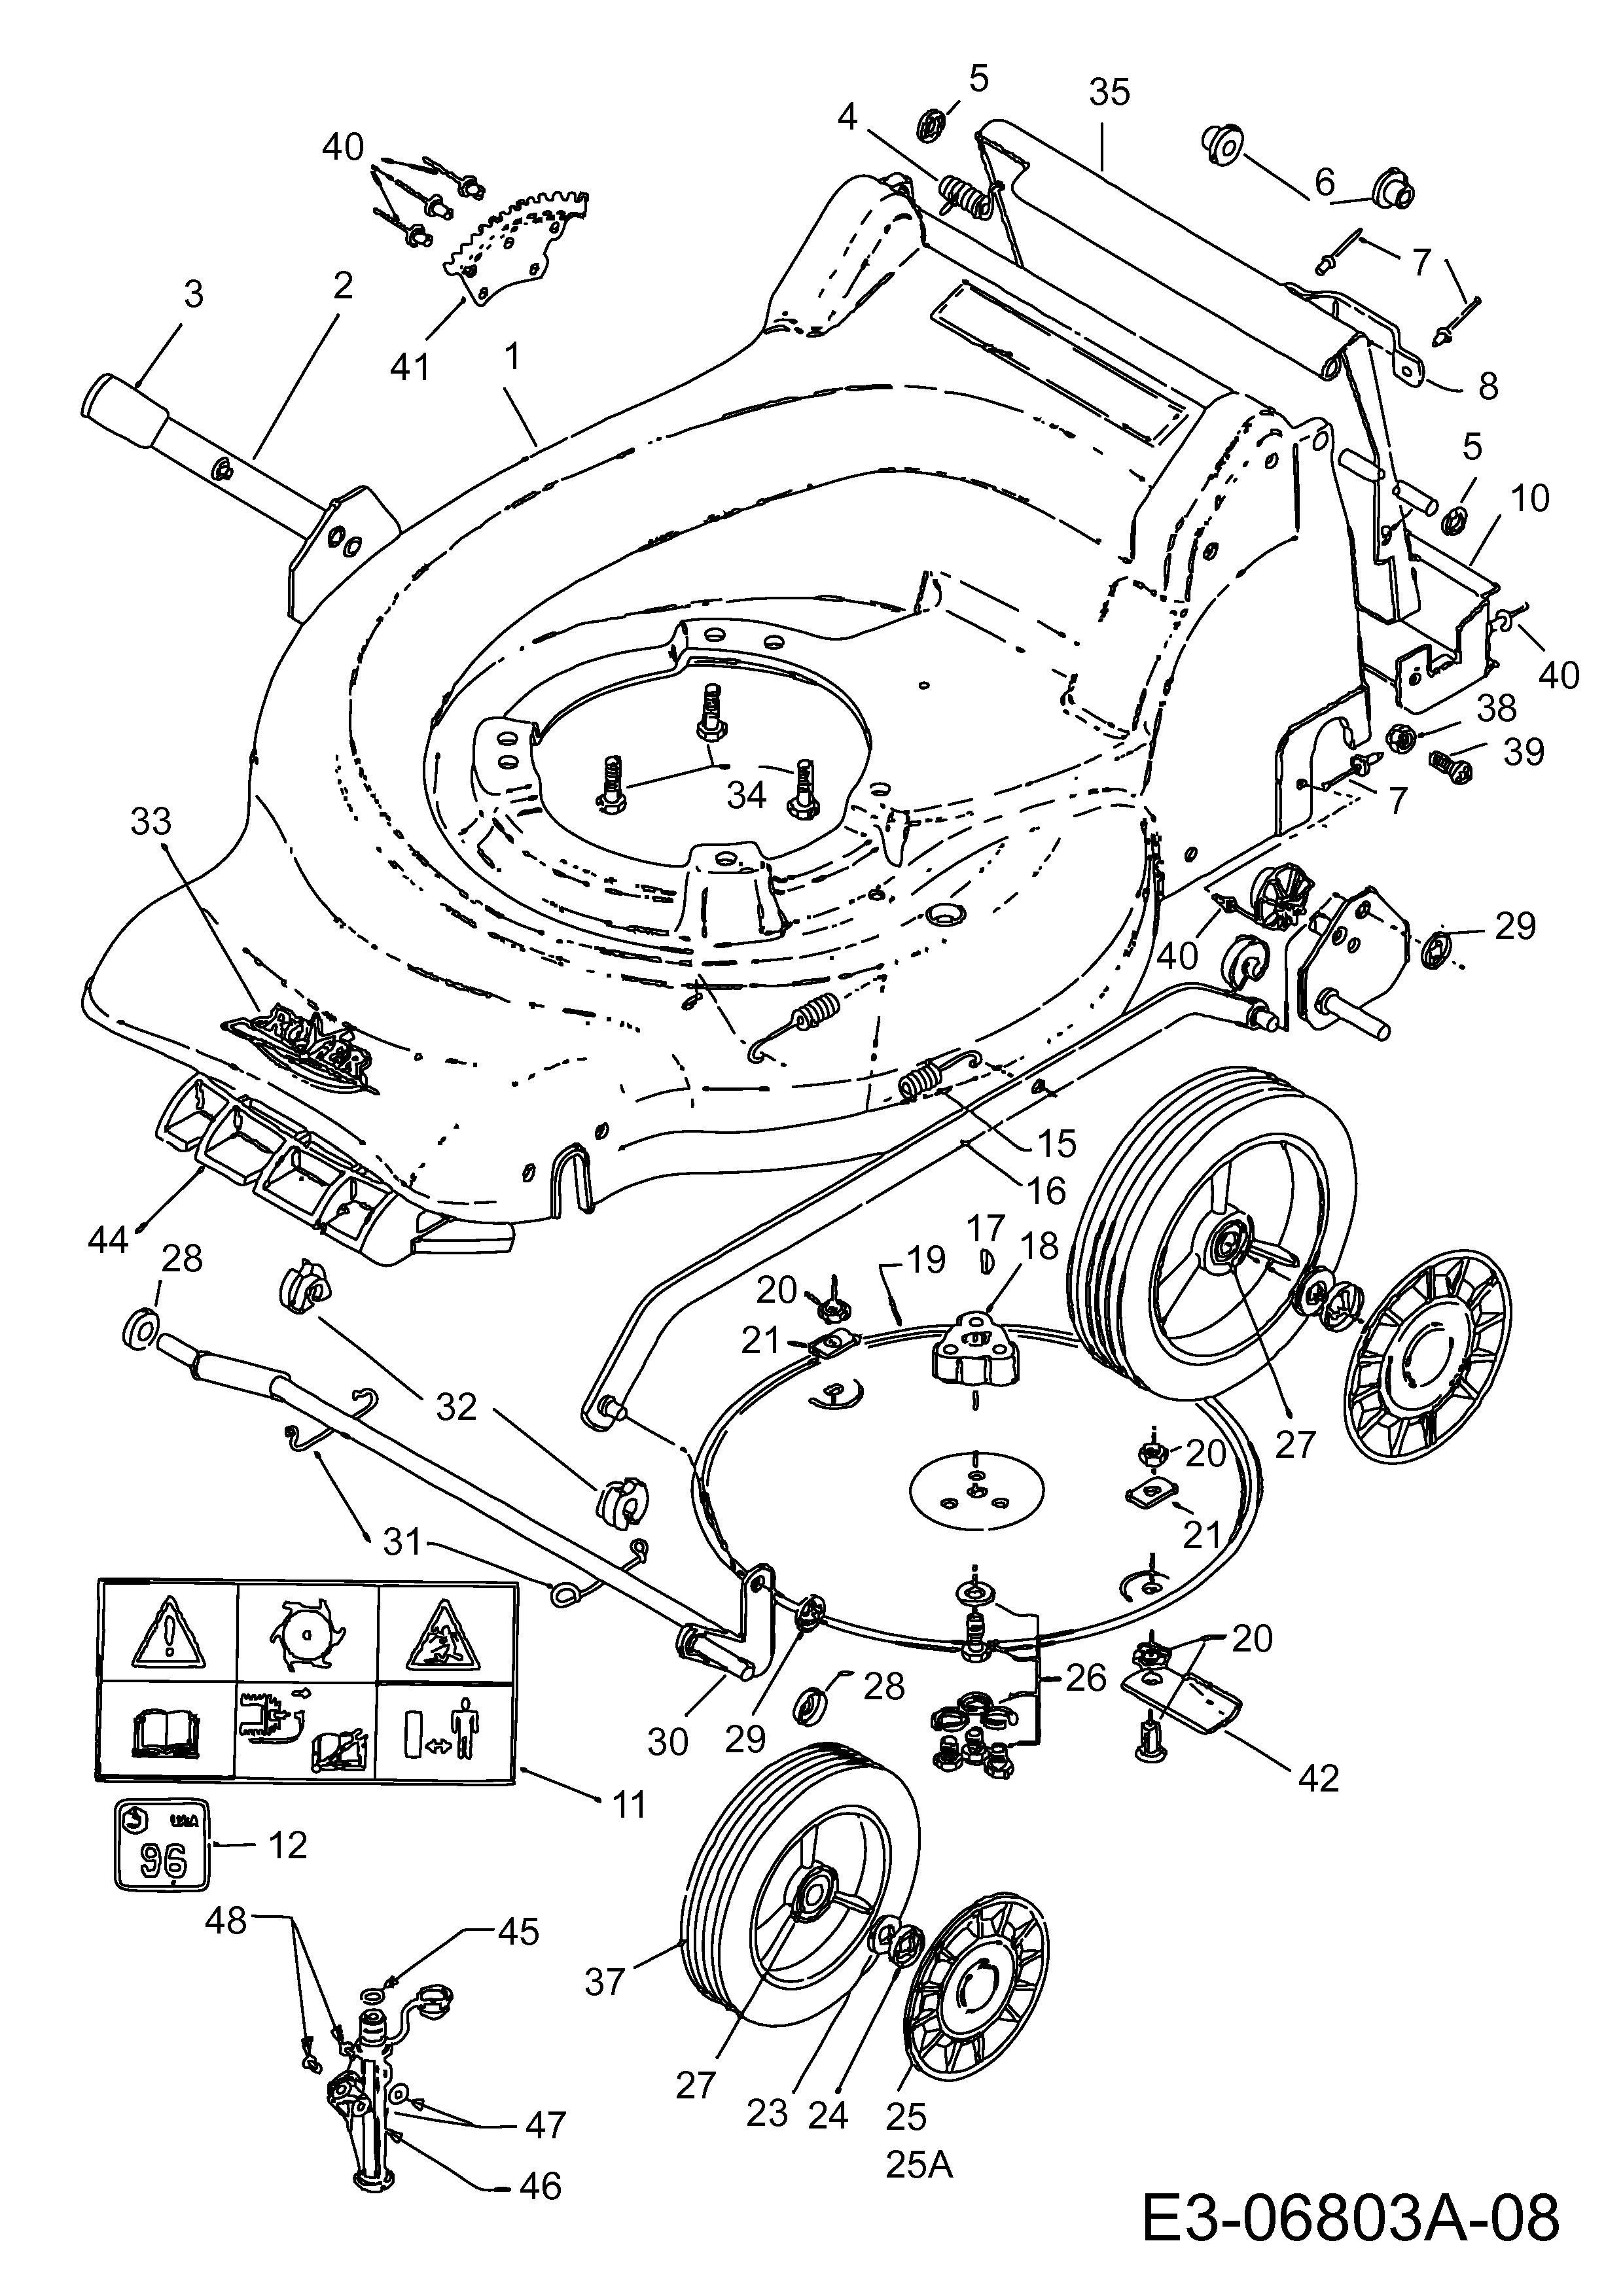 21 Inspirational Craftsman Self Propelled Lawn Mower Belt